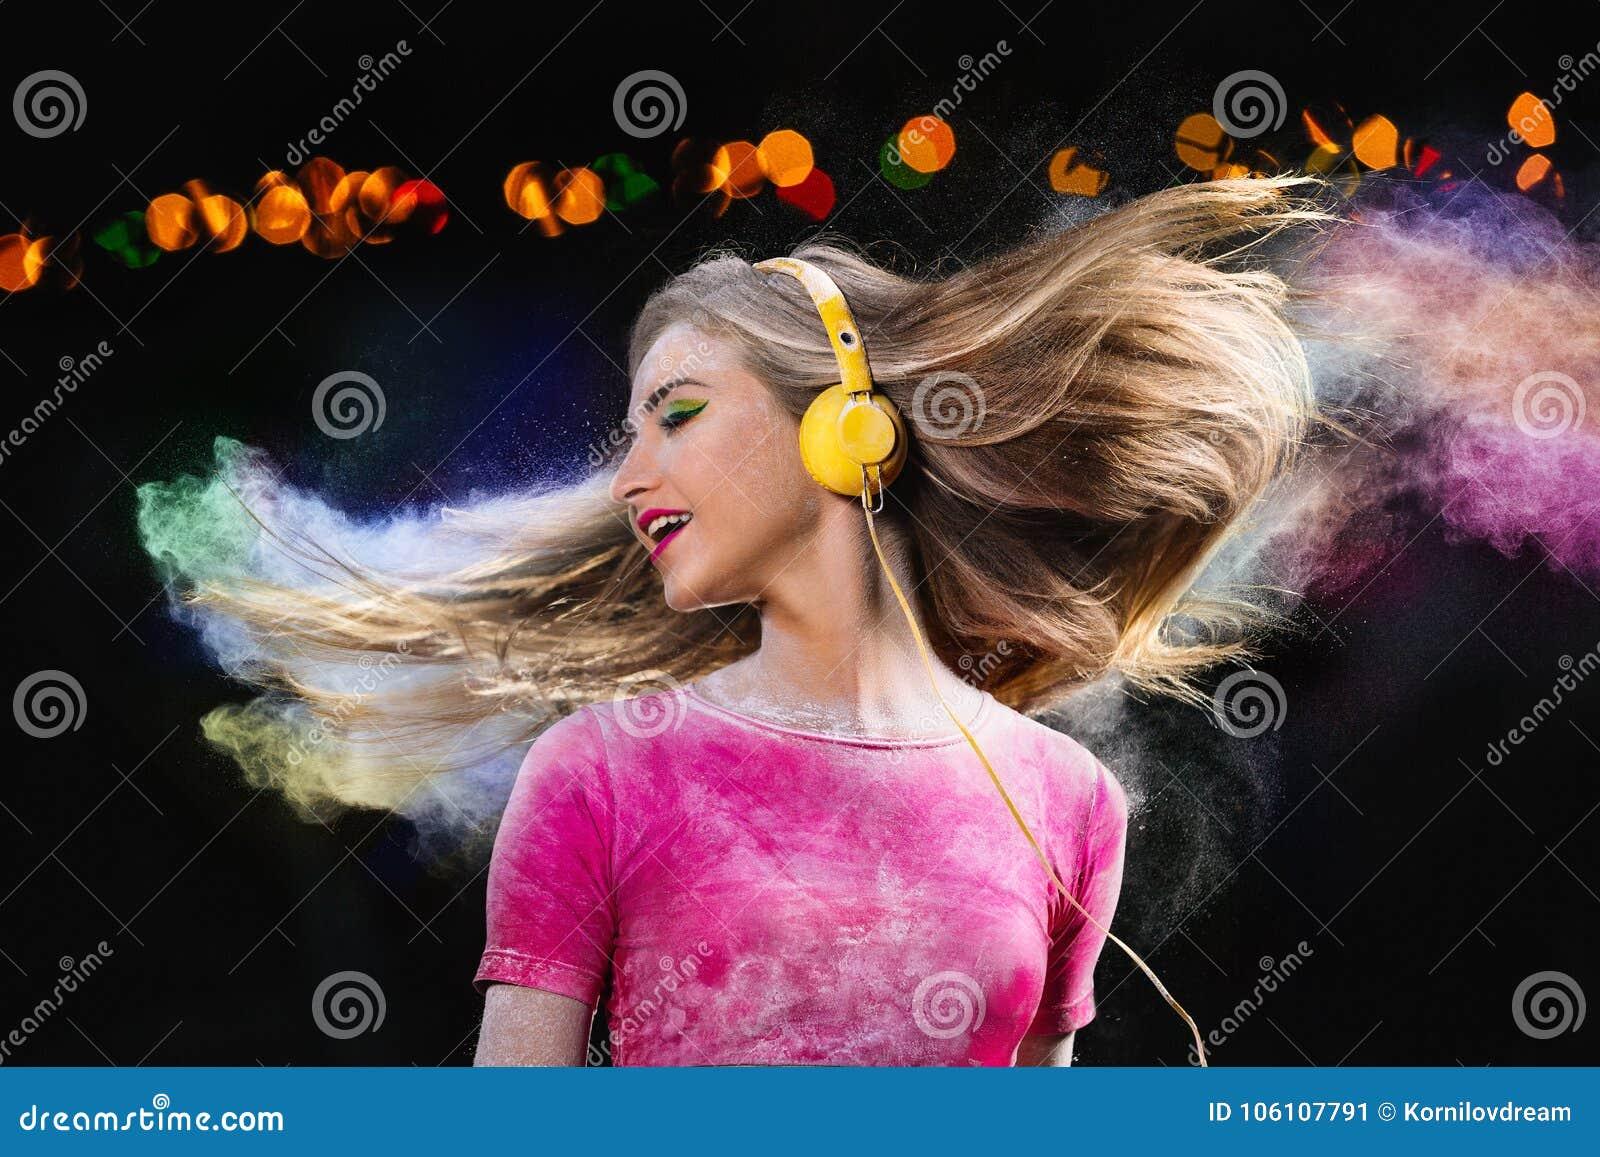 Music in headphones